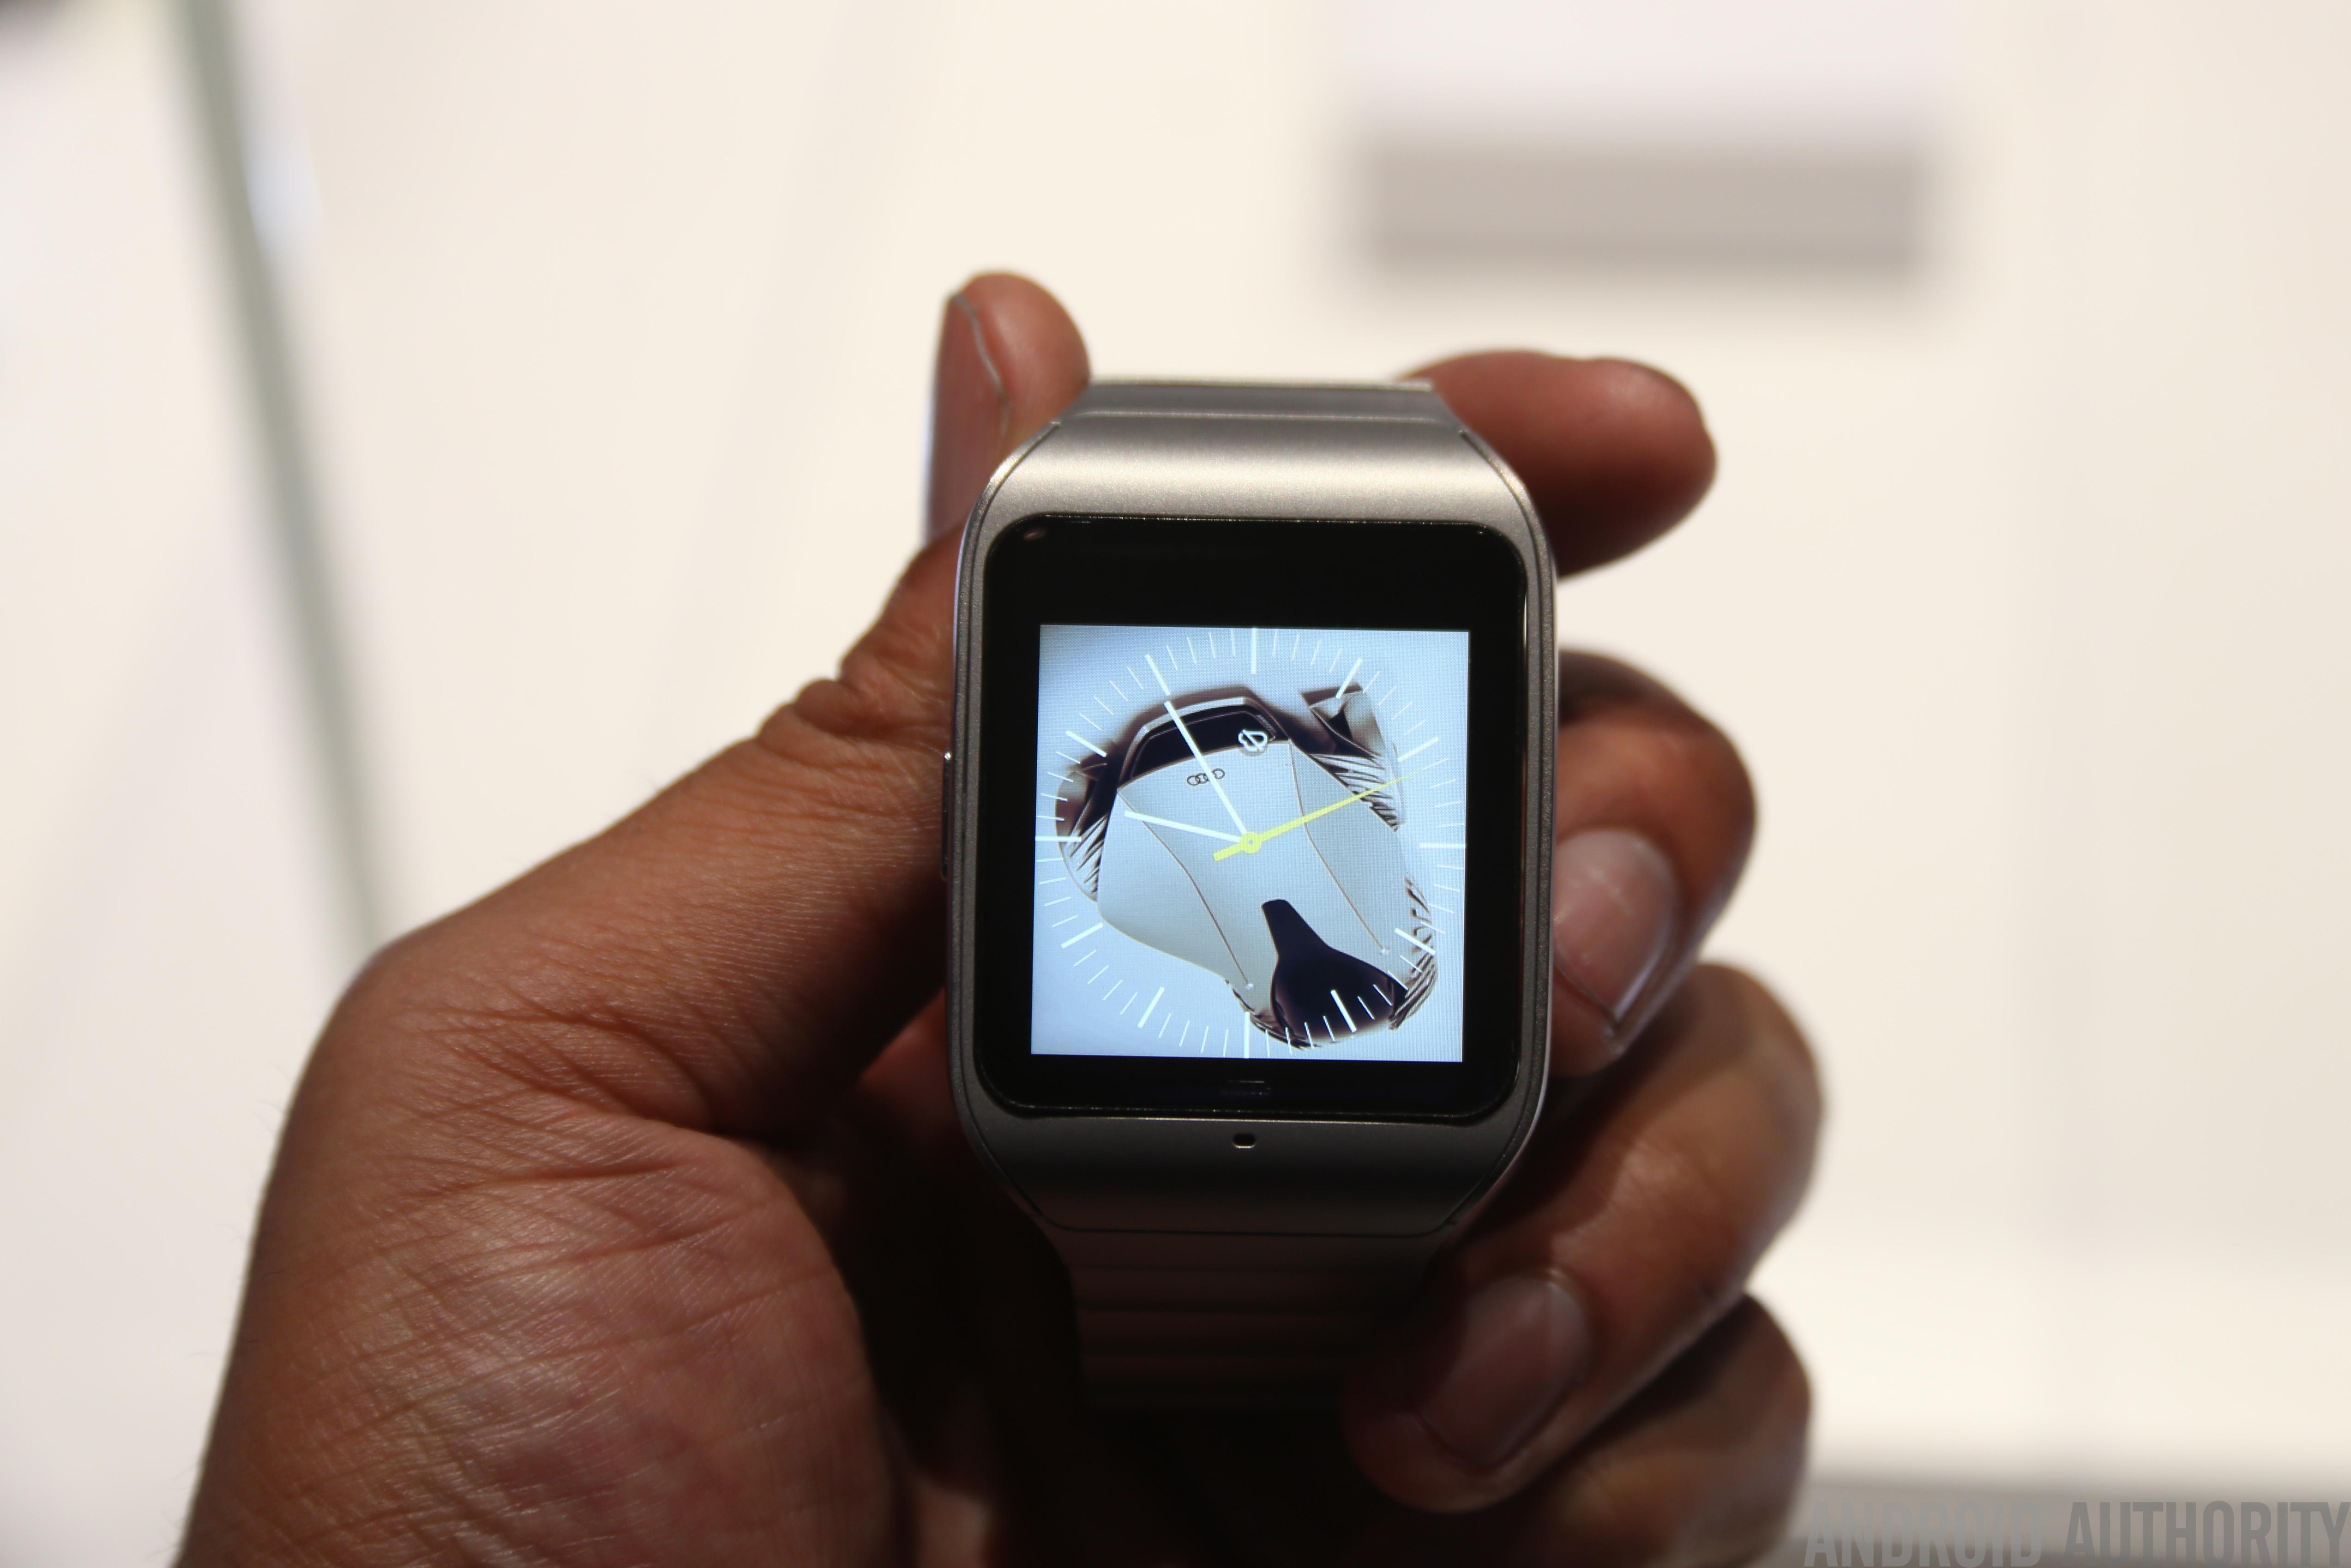 sony smartwatch 3 steel model hands on. Black Bedroom Furniture Sets. Home Design Ideas